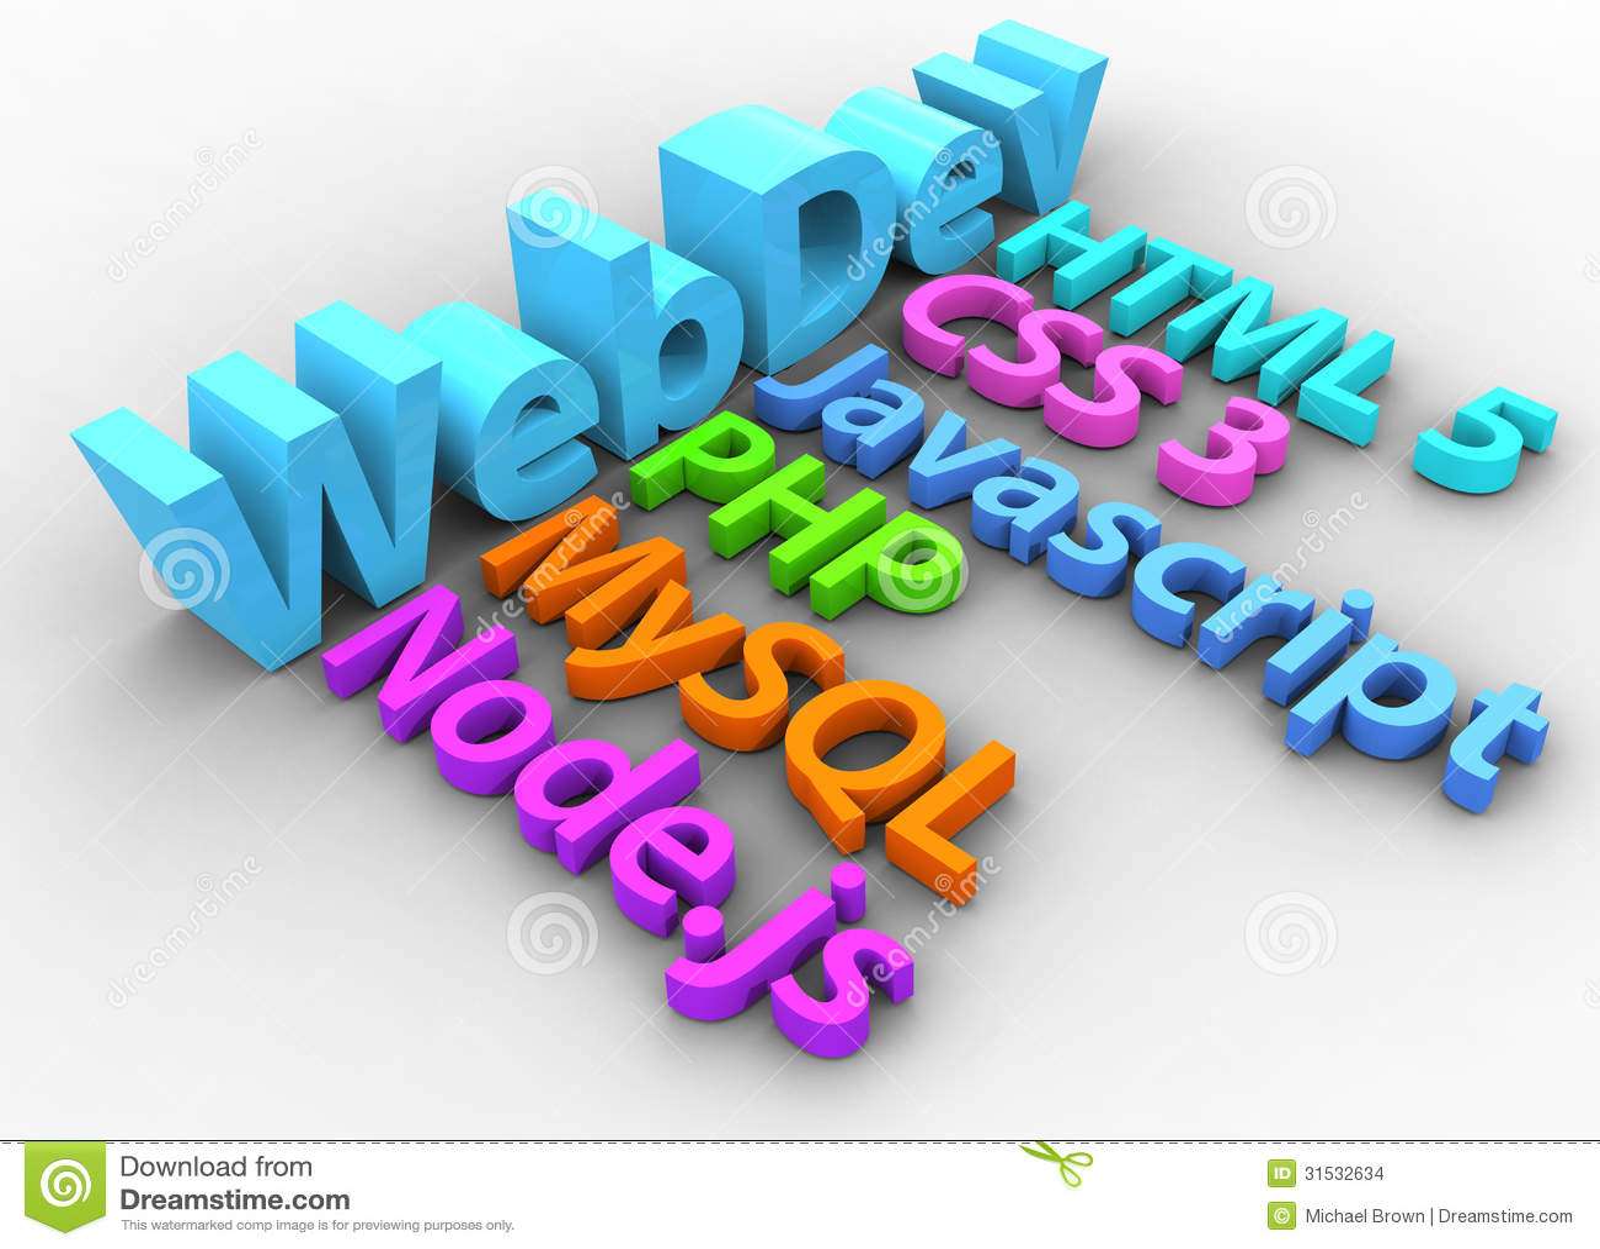 Web Development Tools For HTML Site Stock Illustration